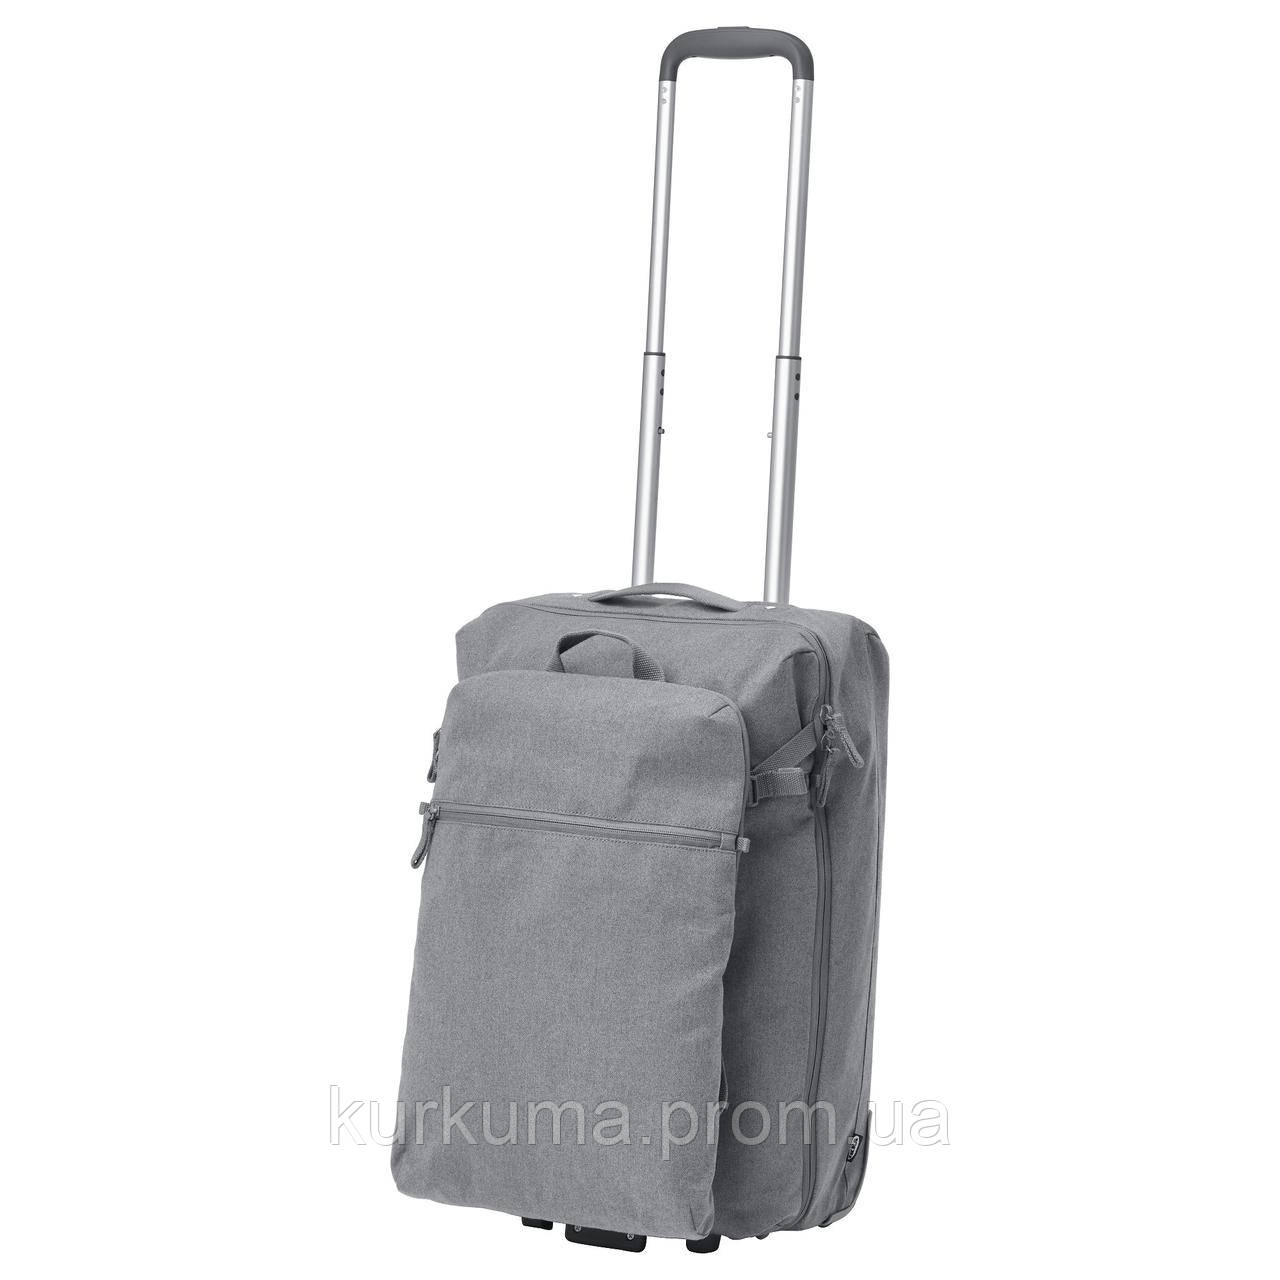 IKEA FORENKLA Сумка на колесиках с рюкзаком, светло-серый  (503.736.10)